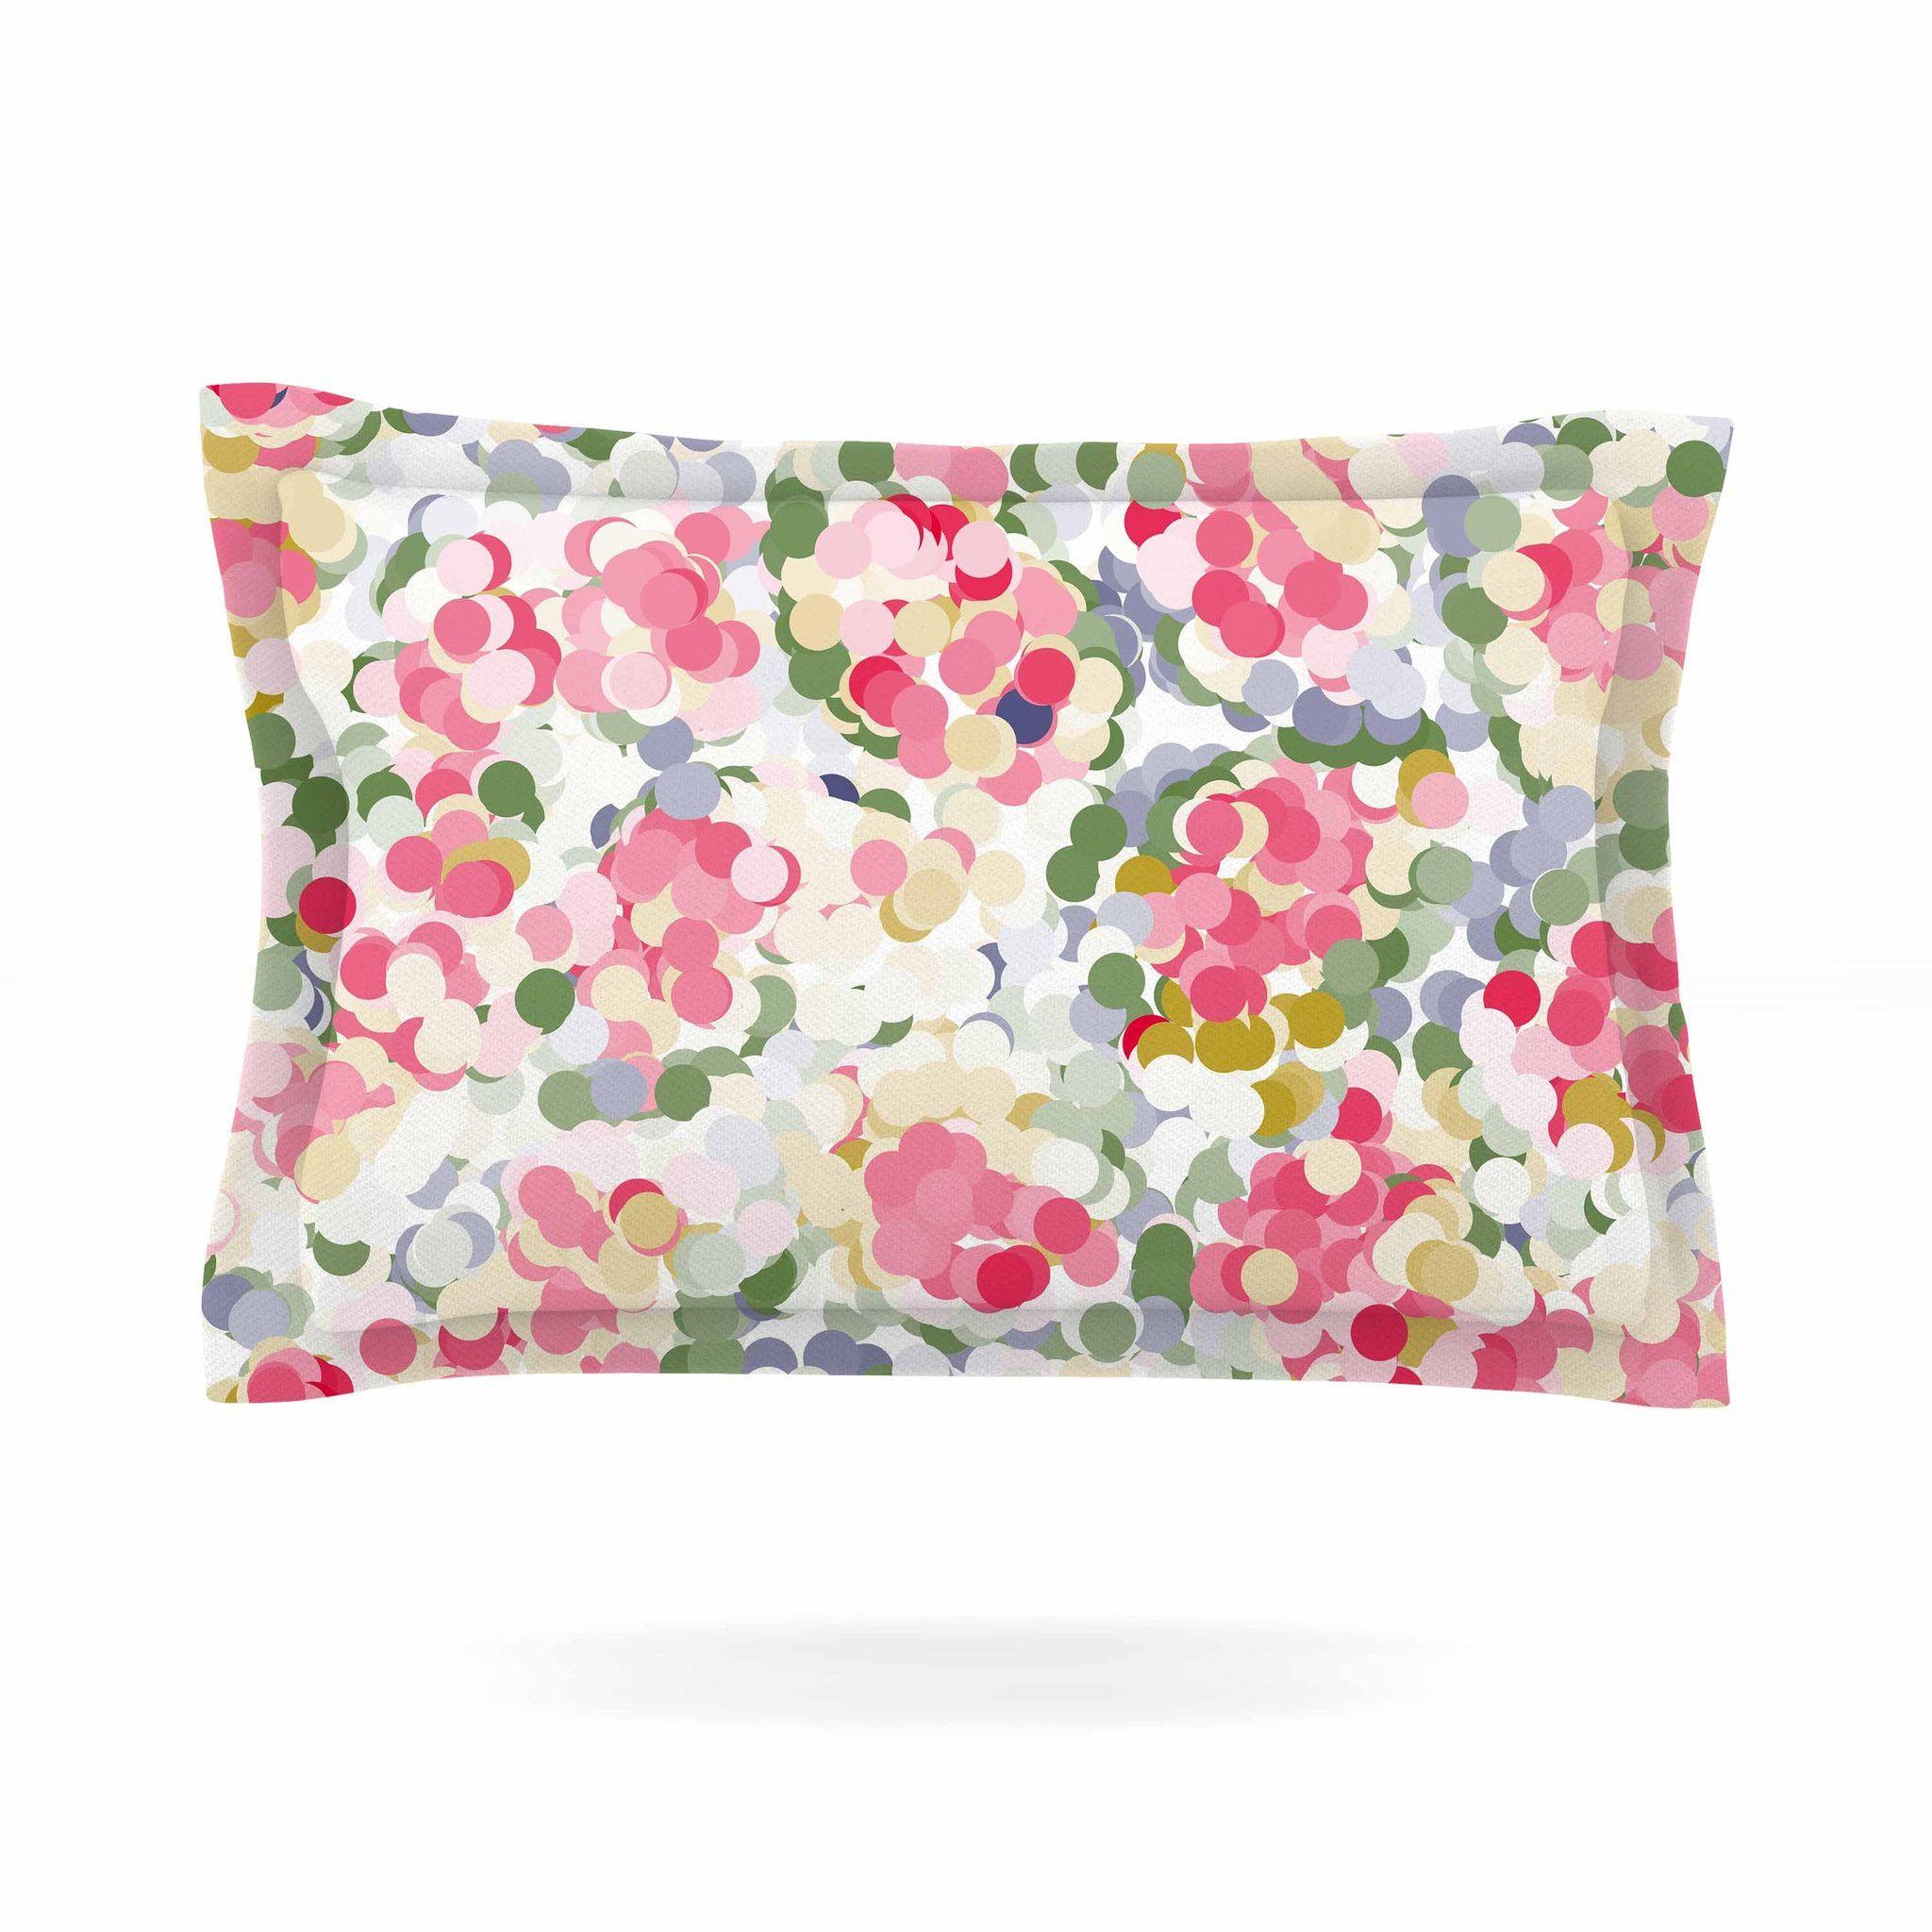 Matthias Hennig Soft Dots Pink Floral Pillow Sham Products